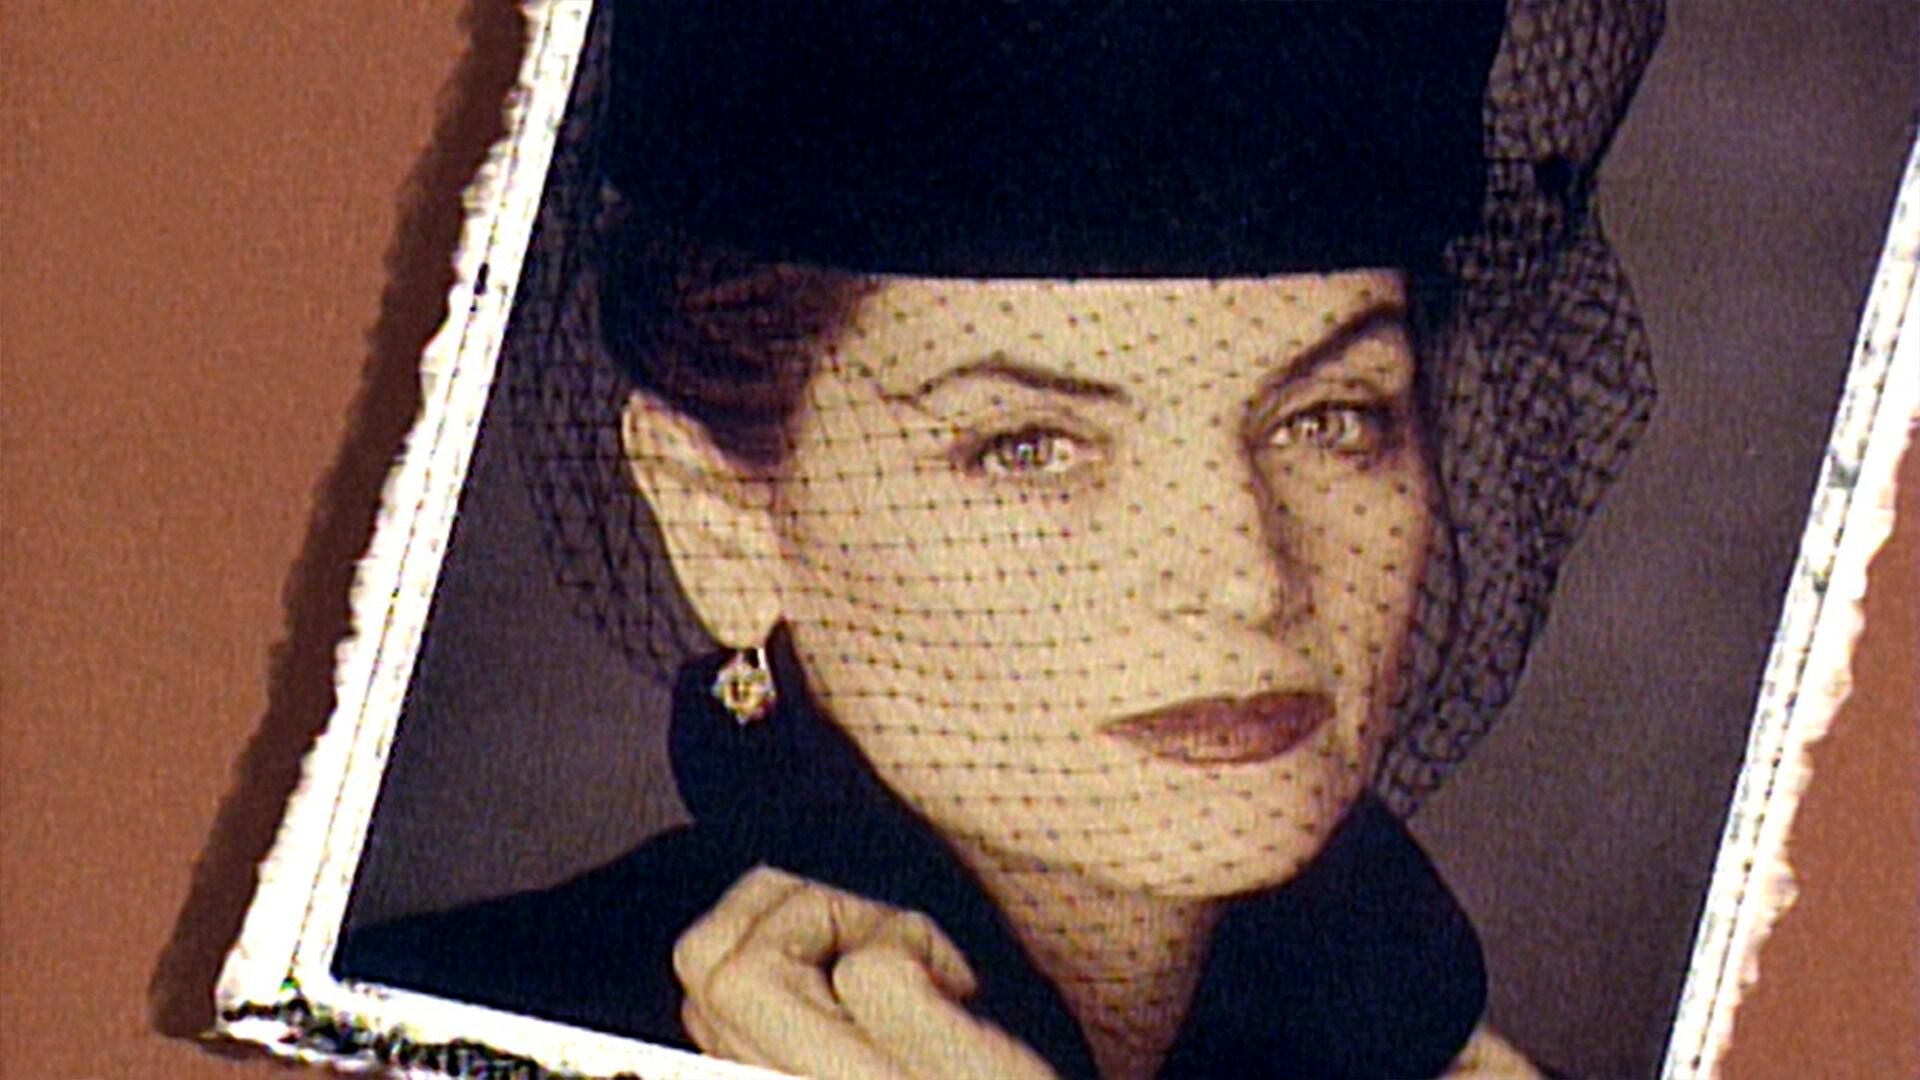 Kirstie Alley: April 17, 1993